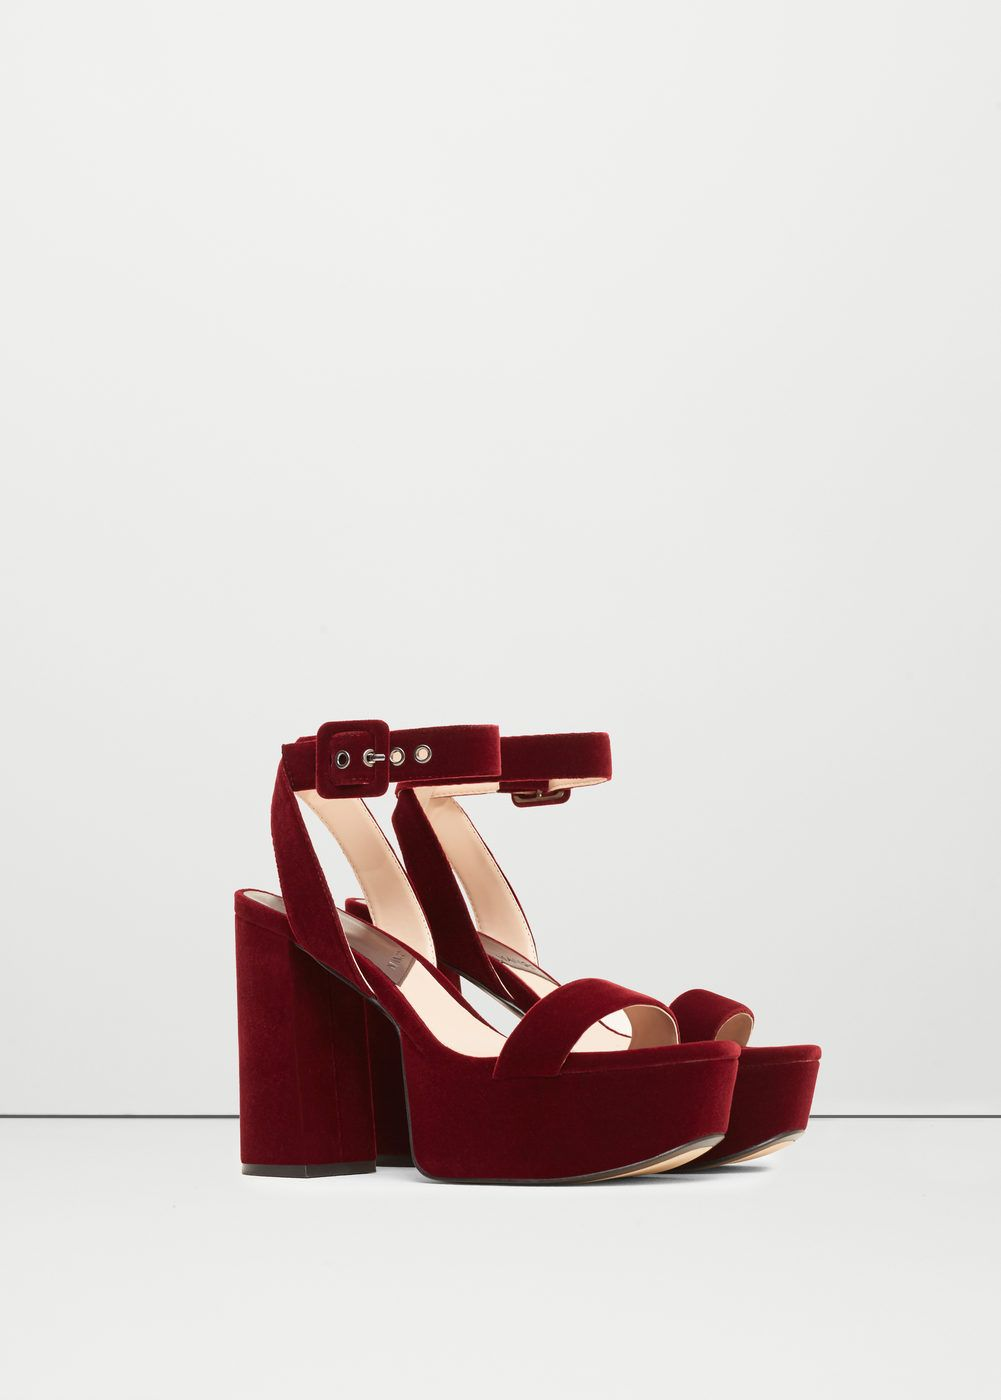 Sandals shoes usa - Platform Velvet Sandals Shoes For Women Mango Usa